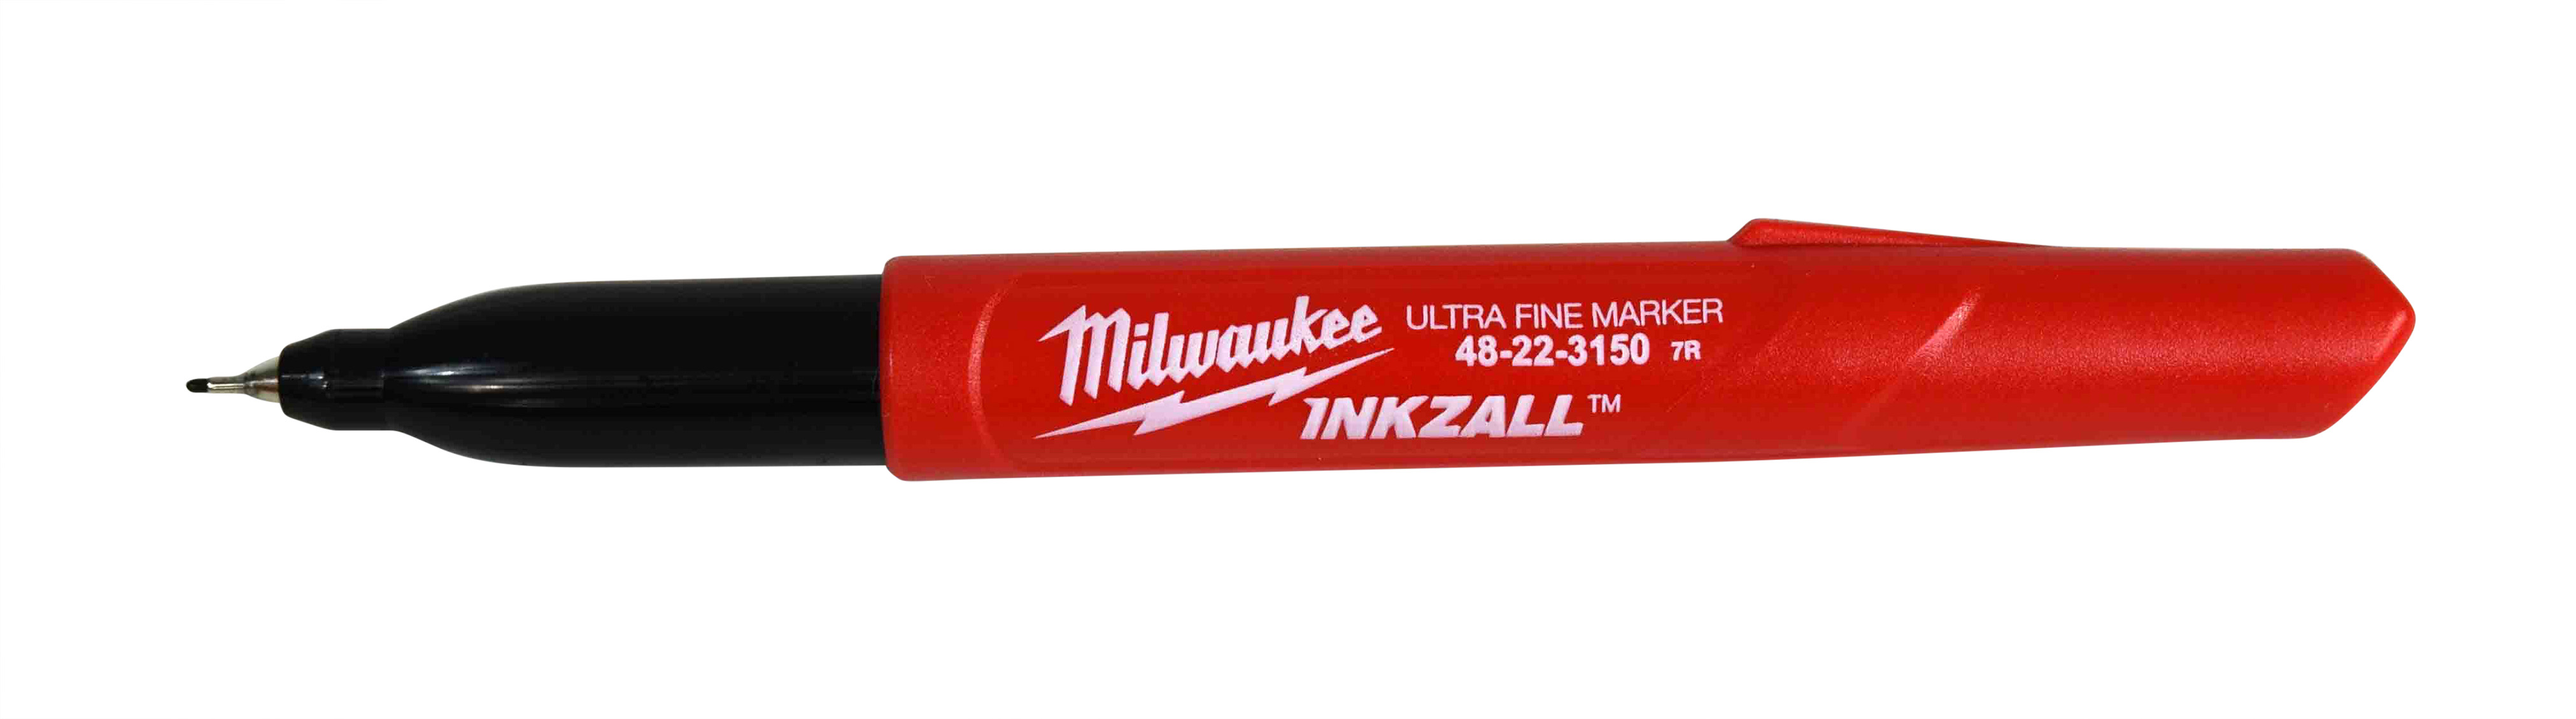 Milwaukee-48-22-3150-Inkzall-Black-Ultra-Fine-Point-Markers-12PK-image-4